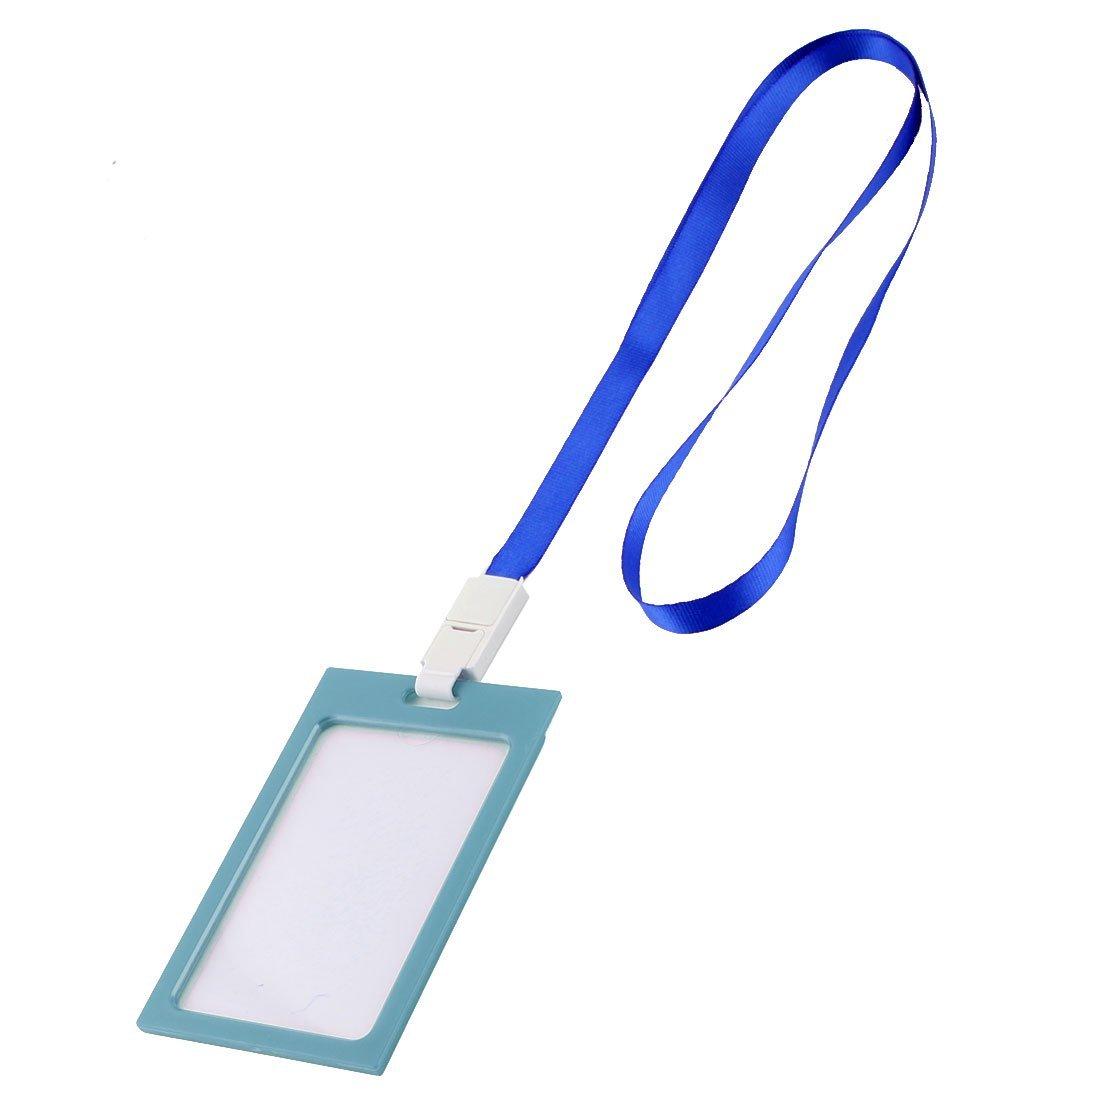 DealMux School Office Plastic Rim Vertical Work Card Case 10 Pcs Aquamarine Blue w Lanyard